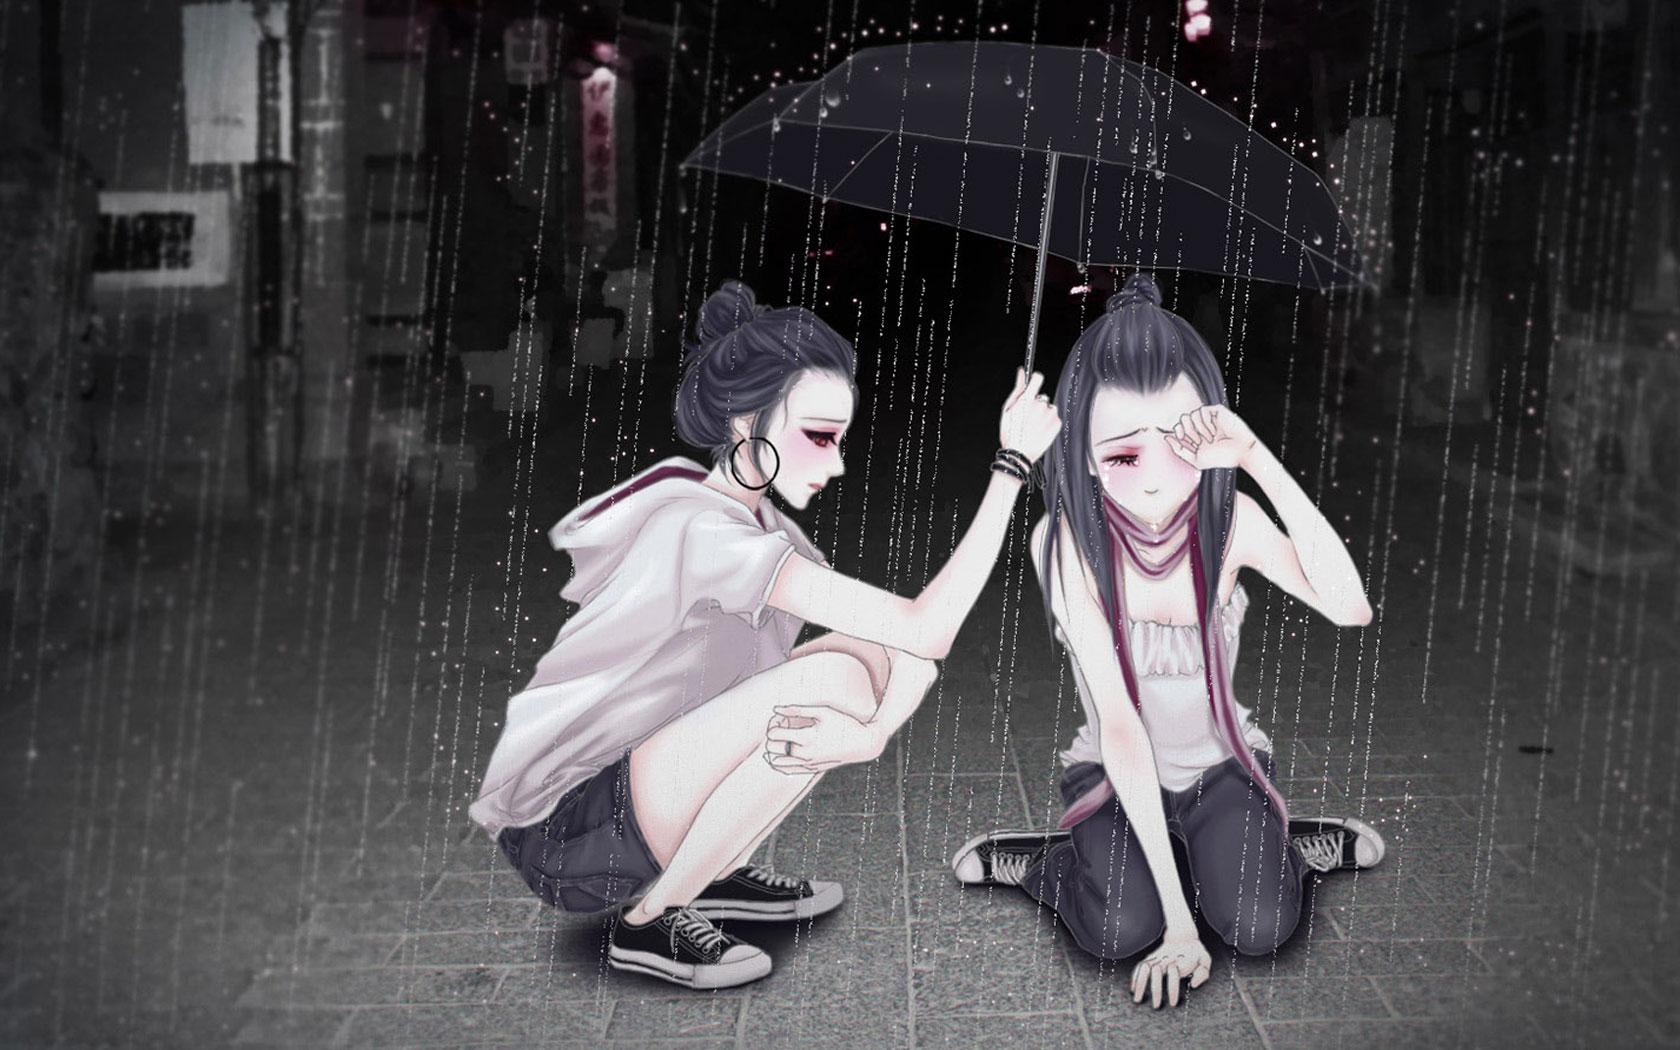 Sad Girl Anime Wallpaper Comics Desktop Background Background Sad Girl Anime 108411 Hd Wallpaper Backgrounds Download